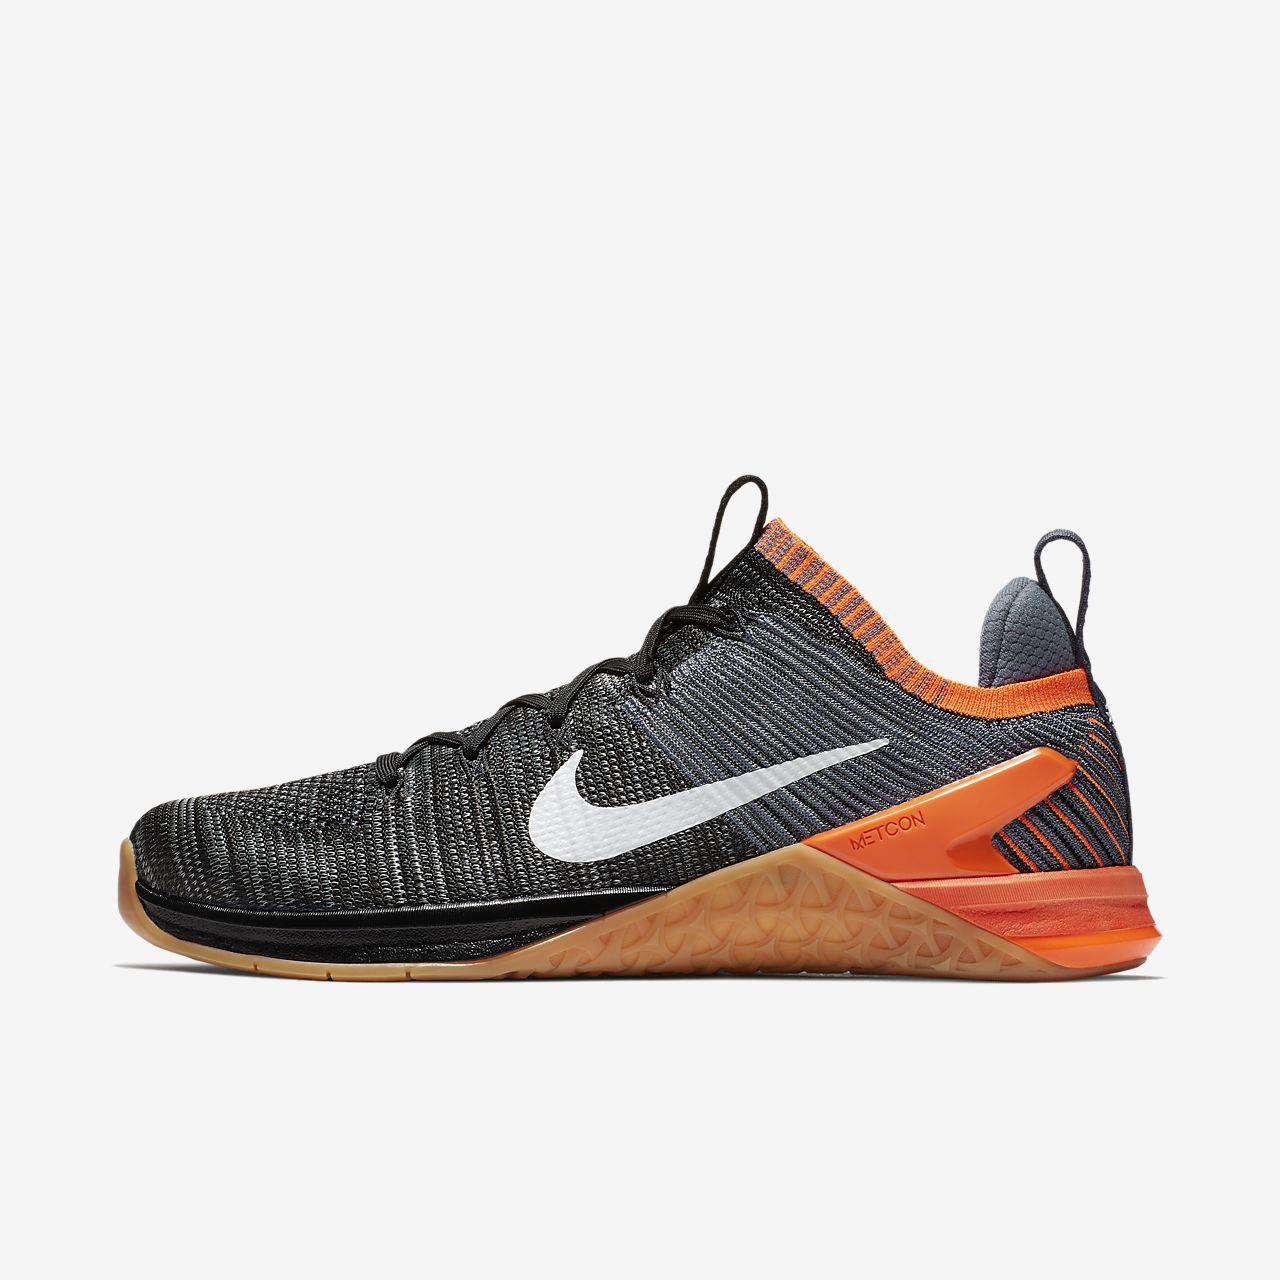 Sast Pas Cher En Ligne Nike Baskets Metcon DSX Flyknit 2 Pas Cher Explorer Sites Internet HDBM515ya